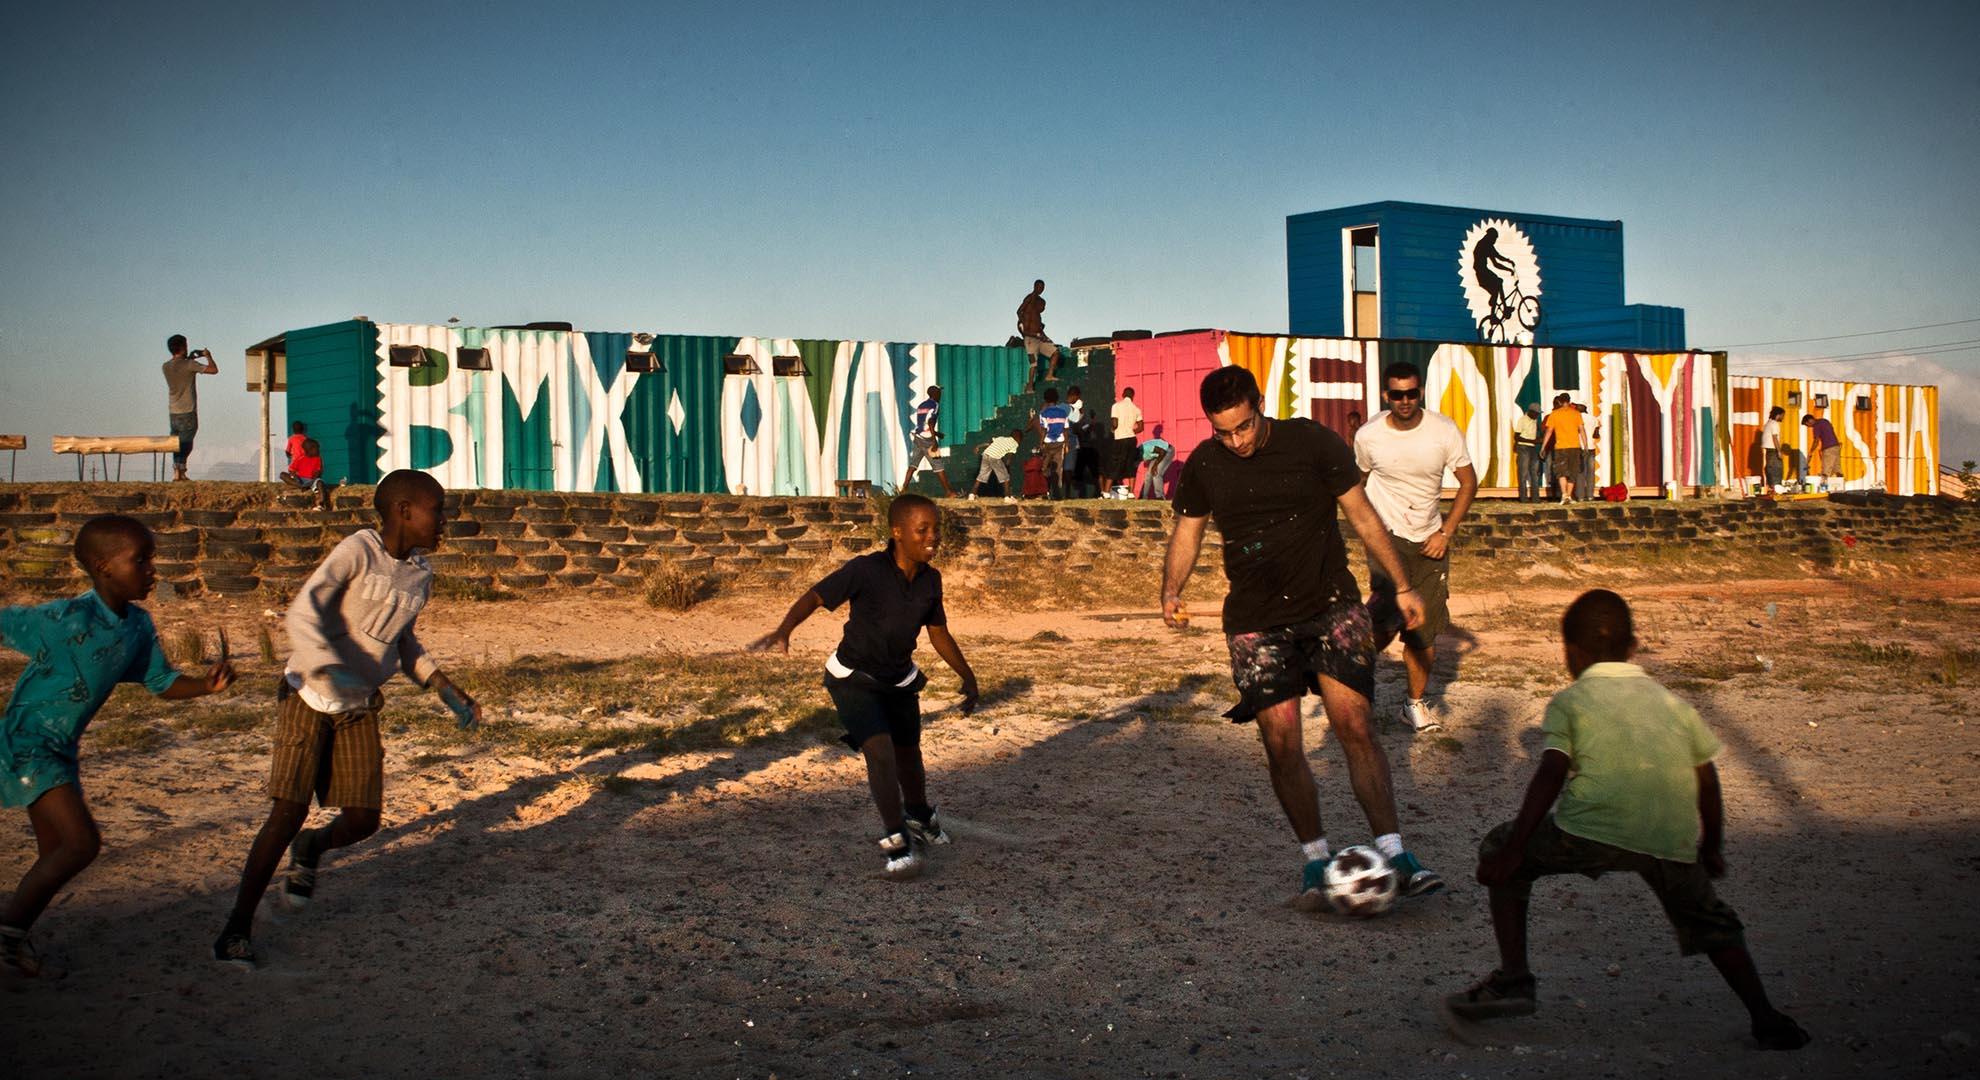 Boa Mistura respects the context in public space.